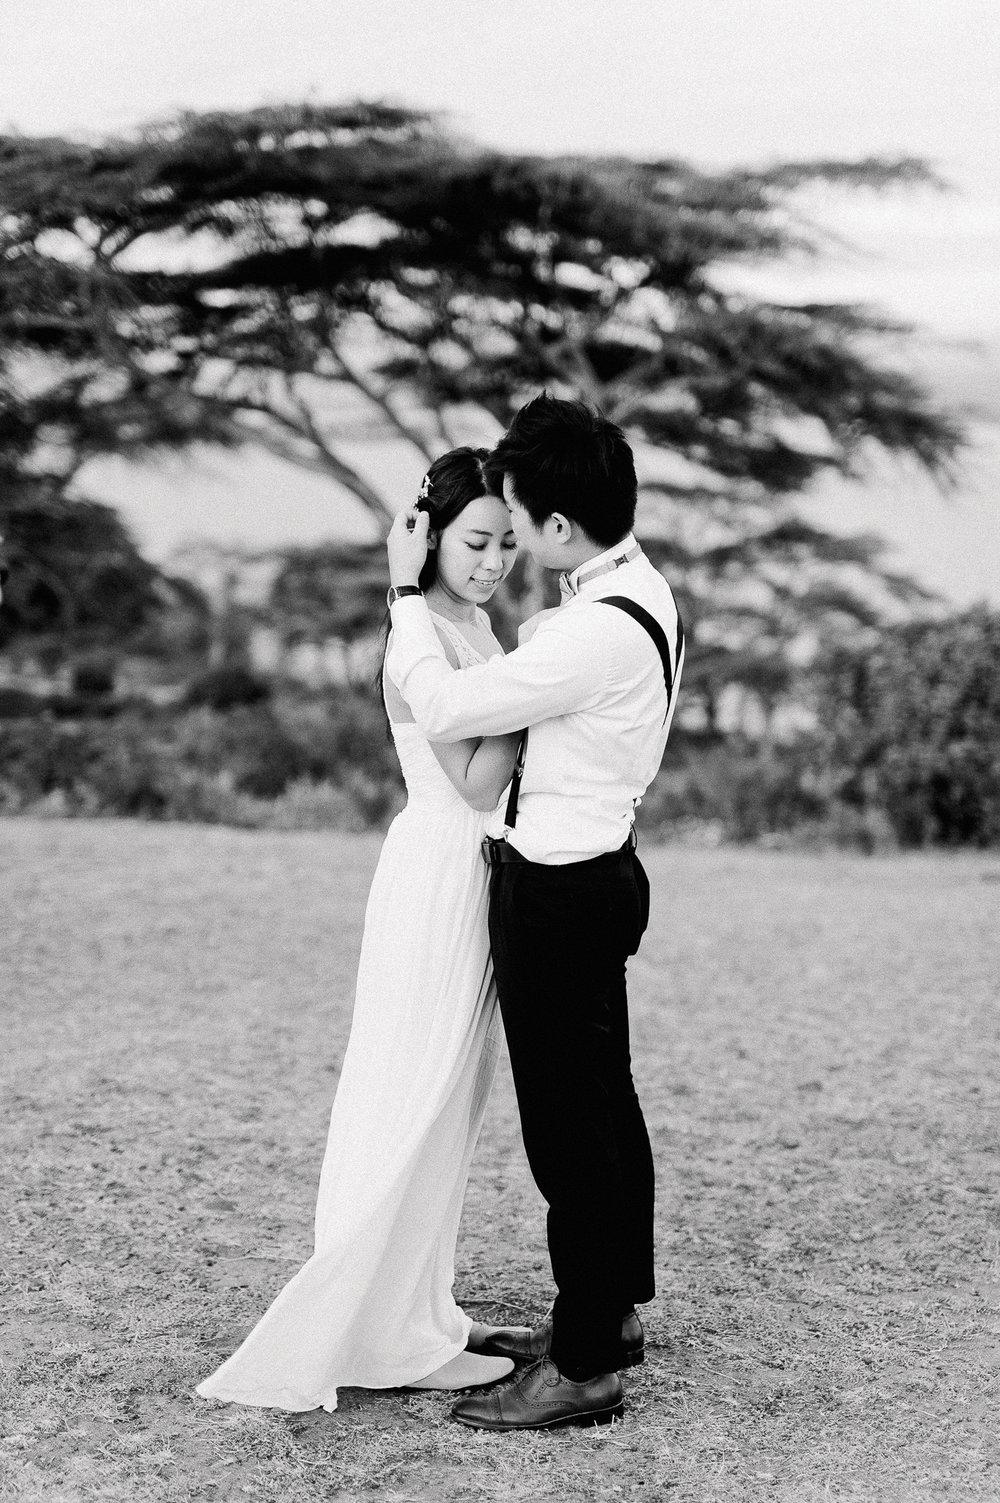 Anna-Hari-Photography-Safari-Elopement-Kenya-Wedding-Photographer-Kenya-91.jpg